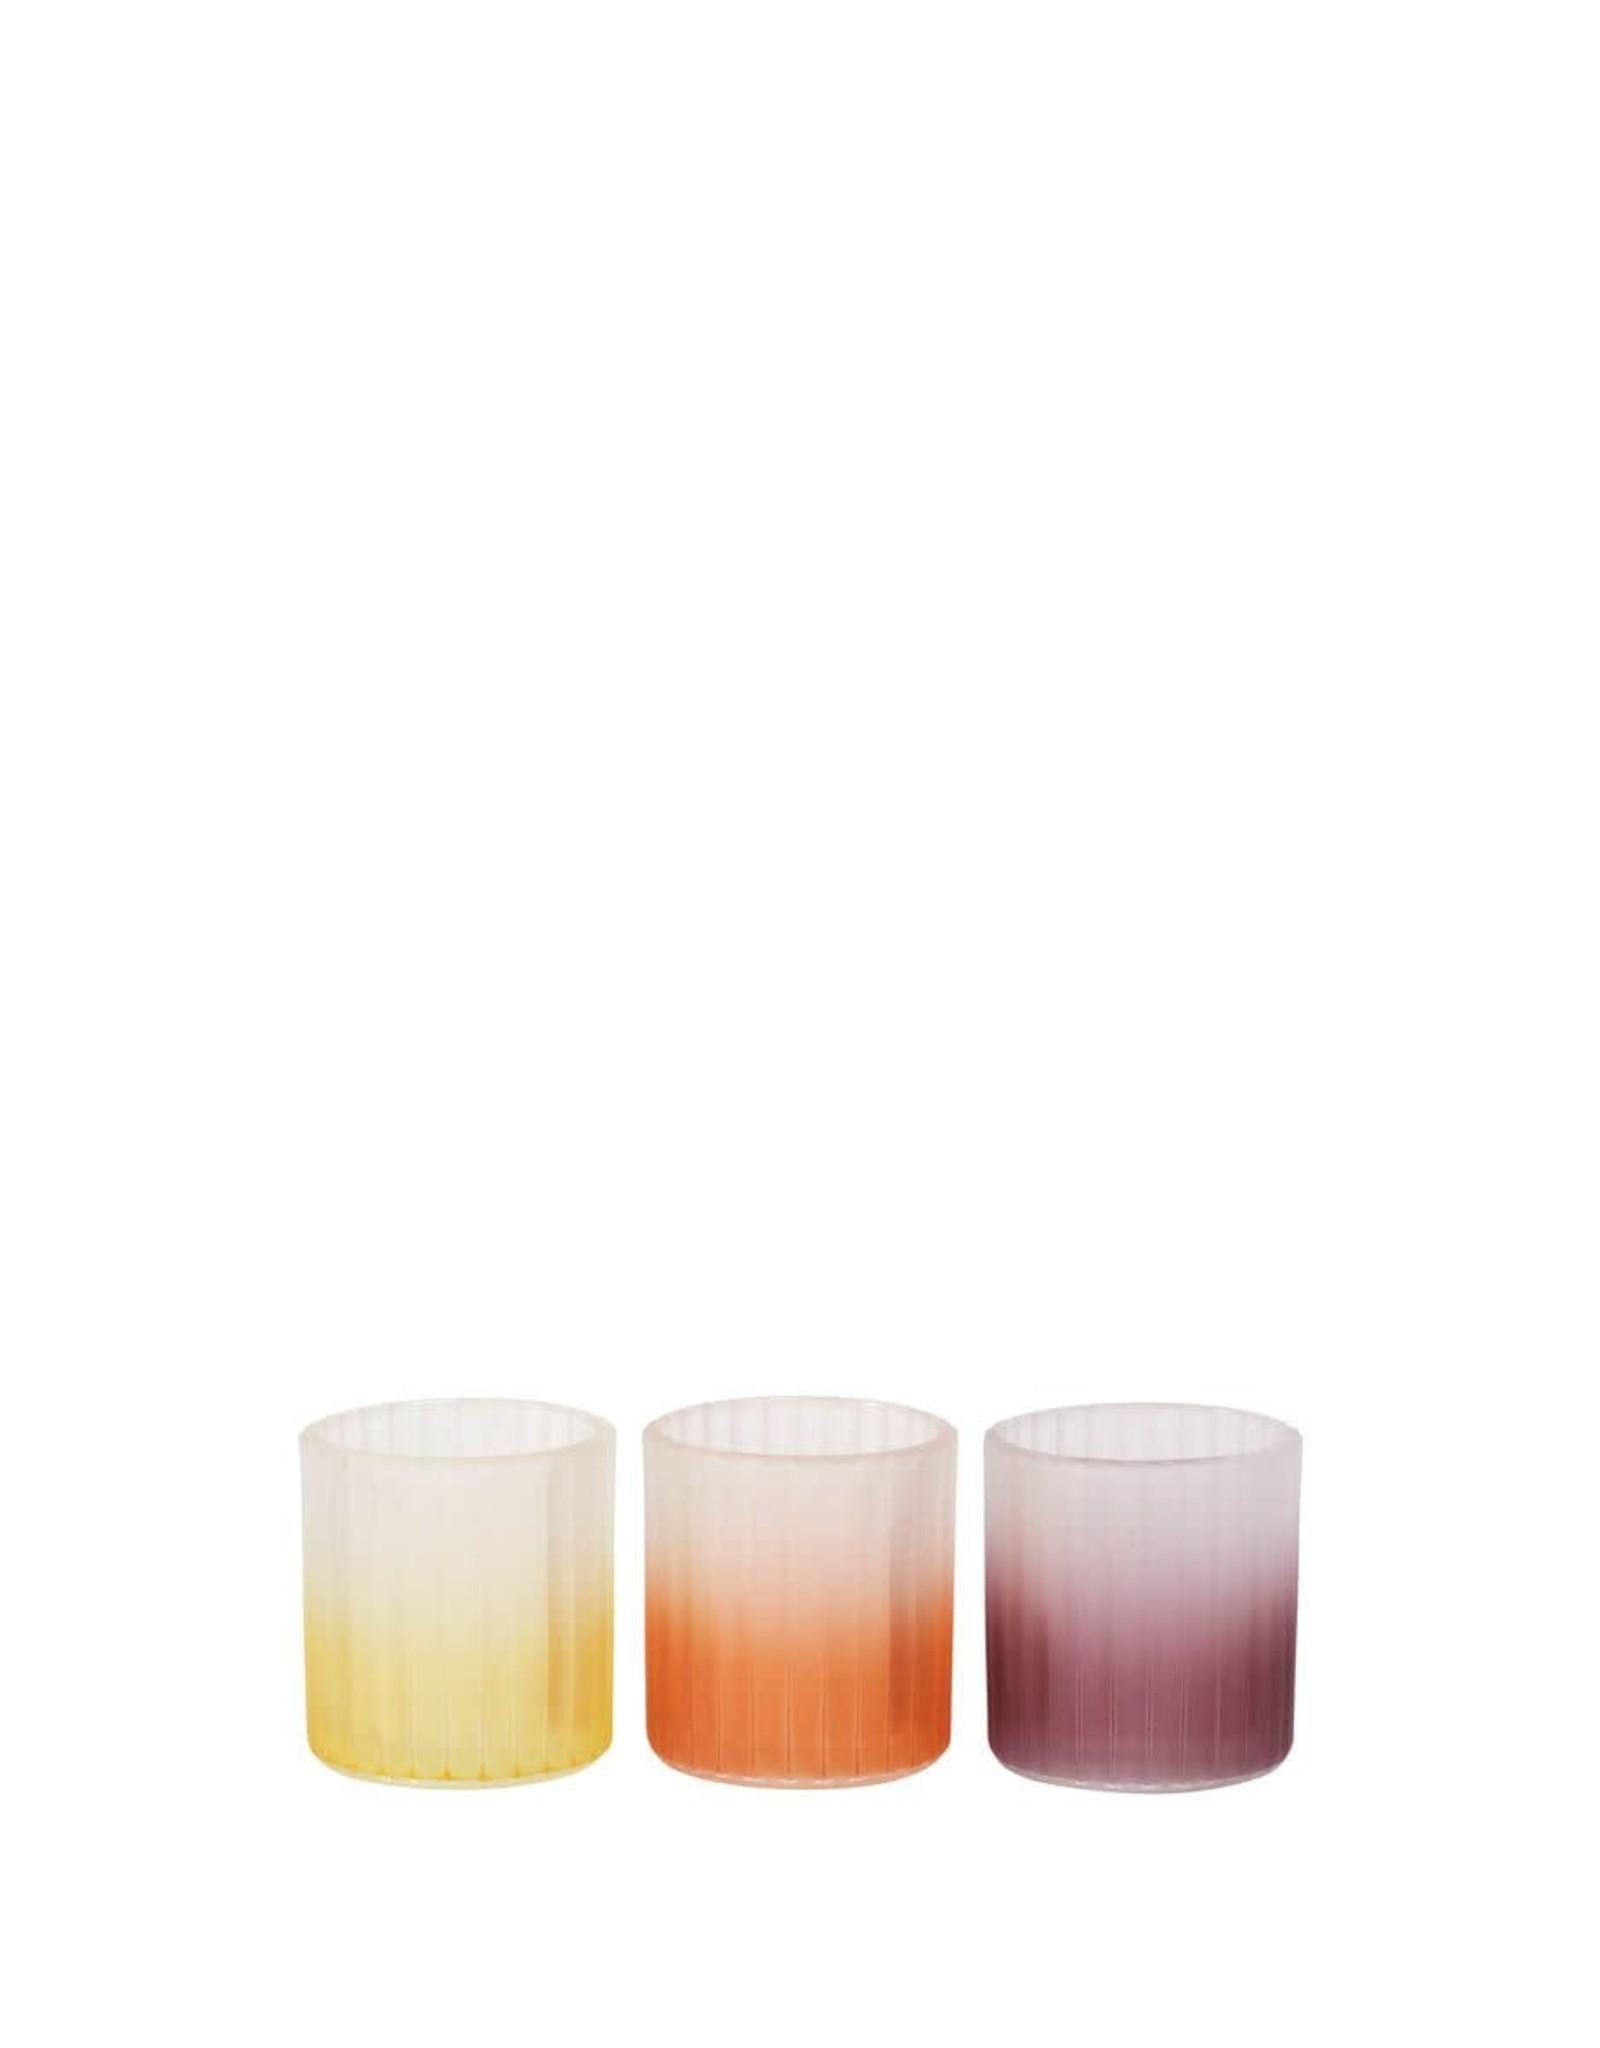 Alflora Waxinehouder D7XH8cm Mix Geel/Lila/Oranje Set/3